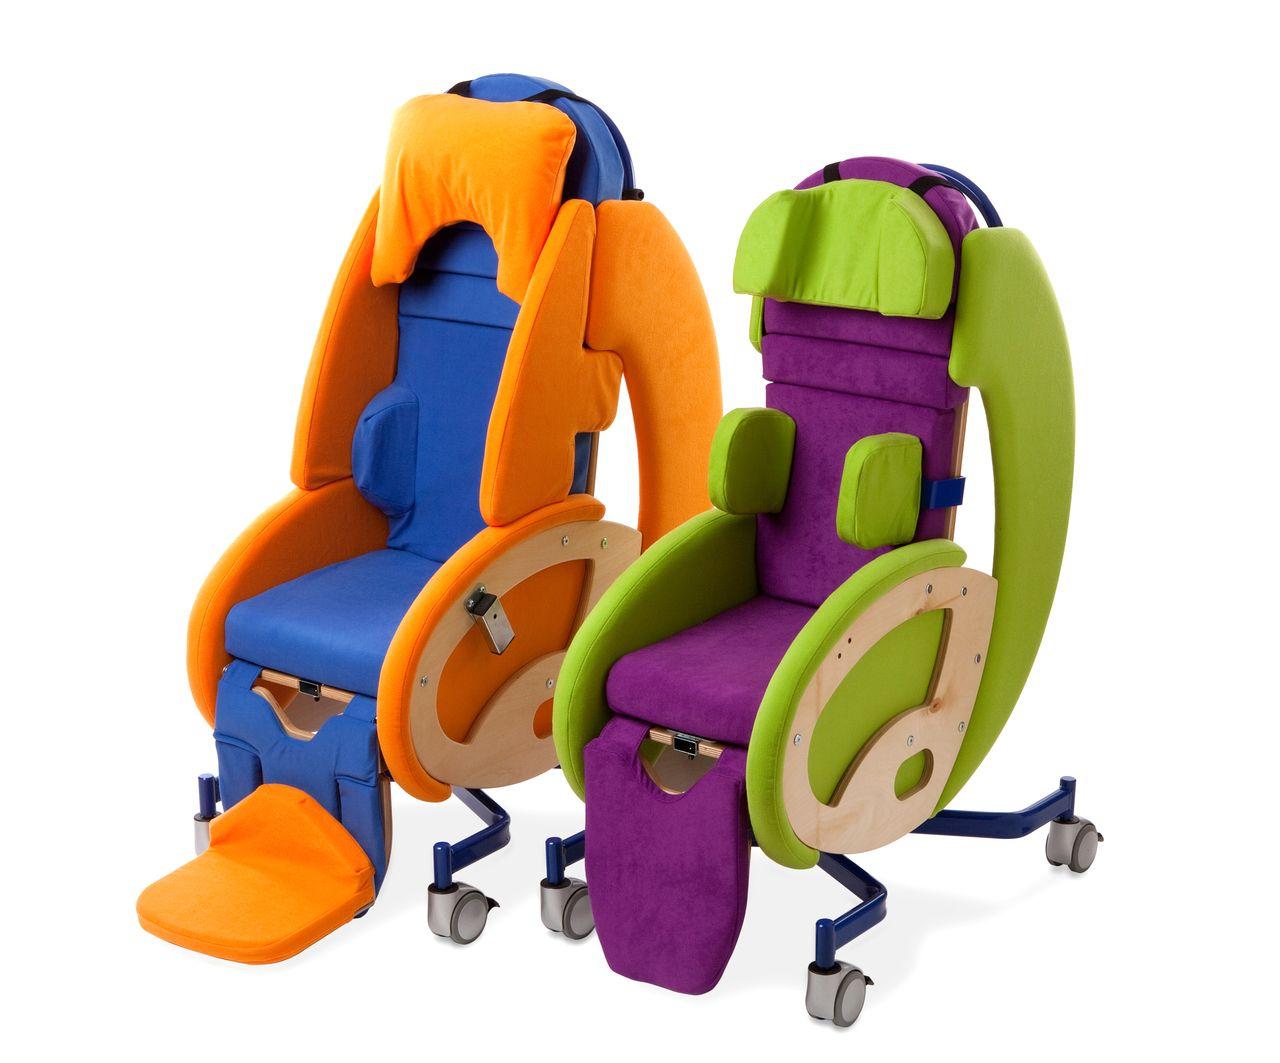 Huggle posture chair pme group pty ltd childrens